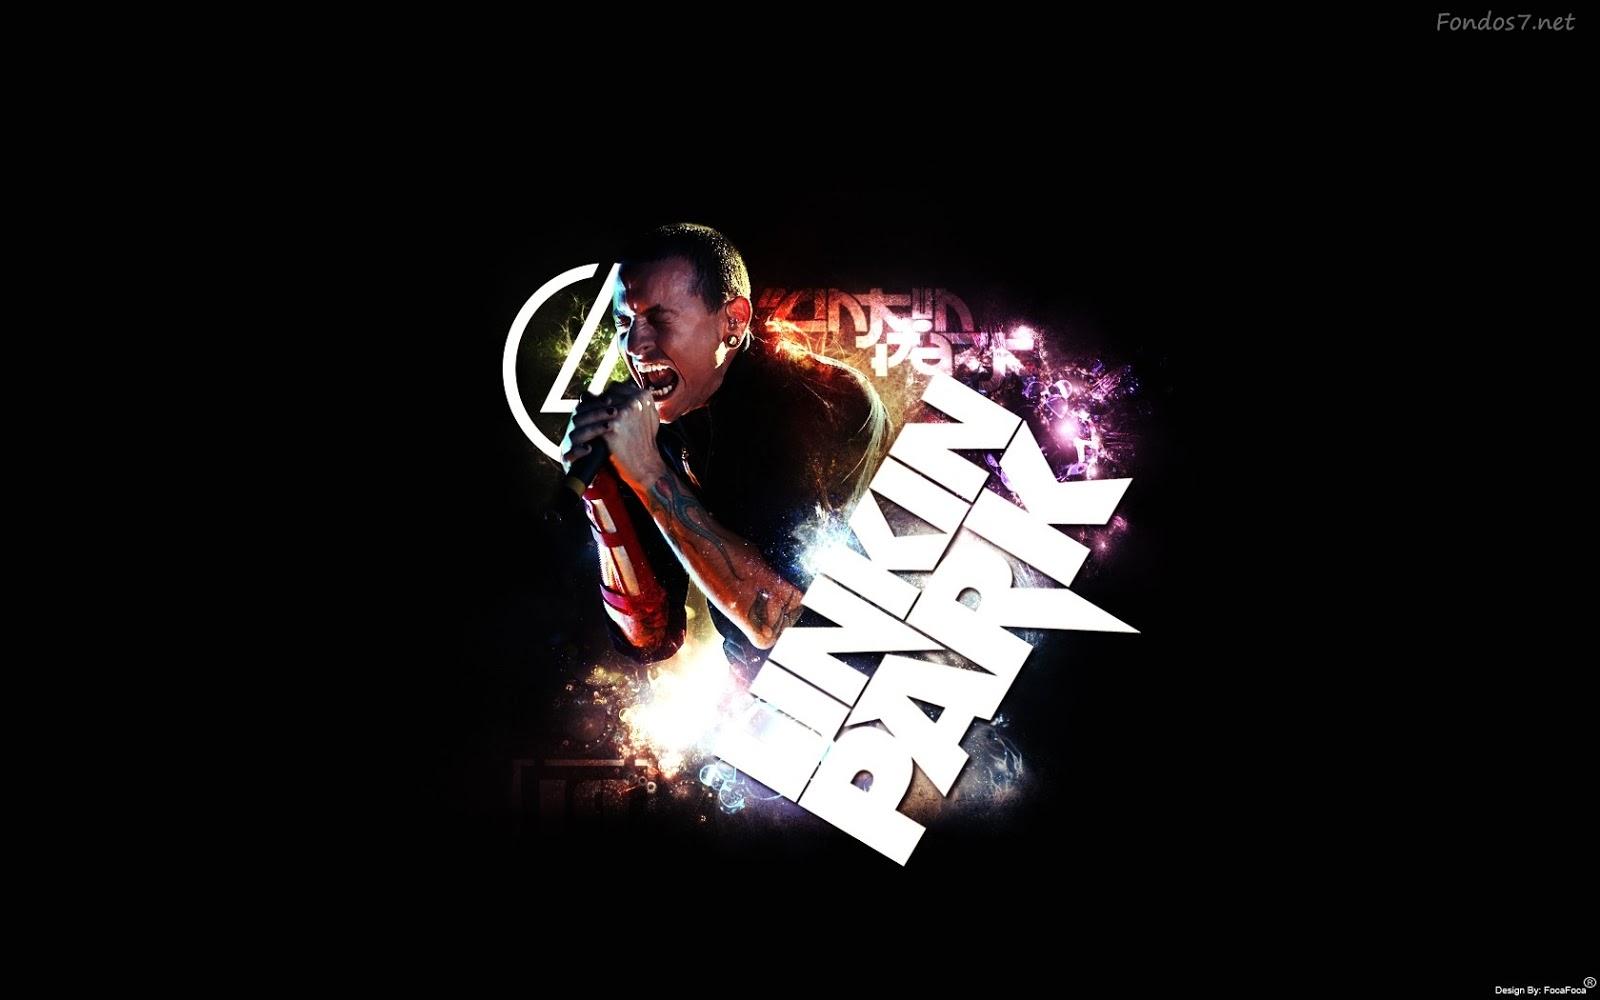 Killzone Shadow Fall Full Hd Wallpaper Wallpapers Hd Linkin Park Banda De Rock 32 Hd